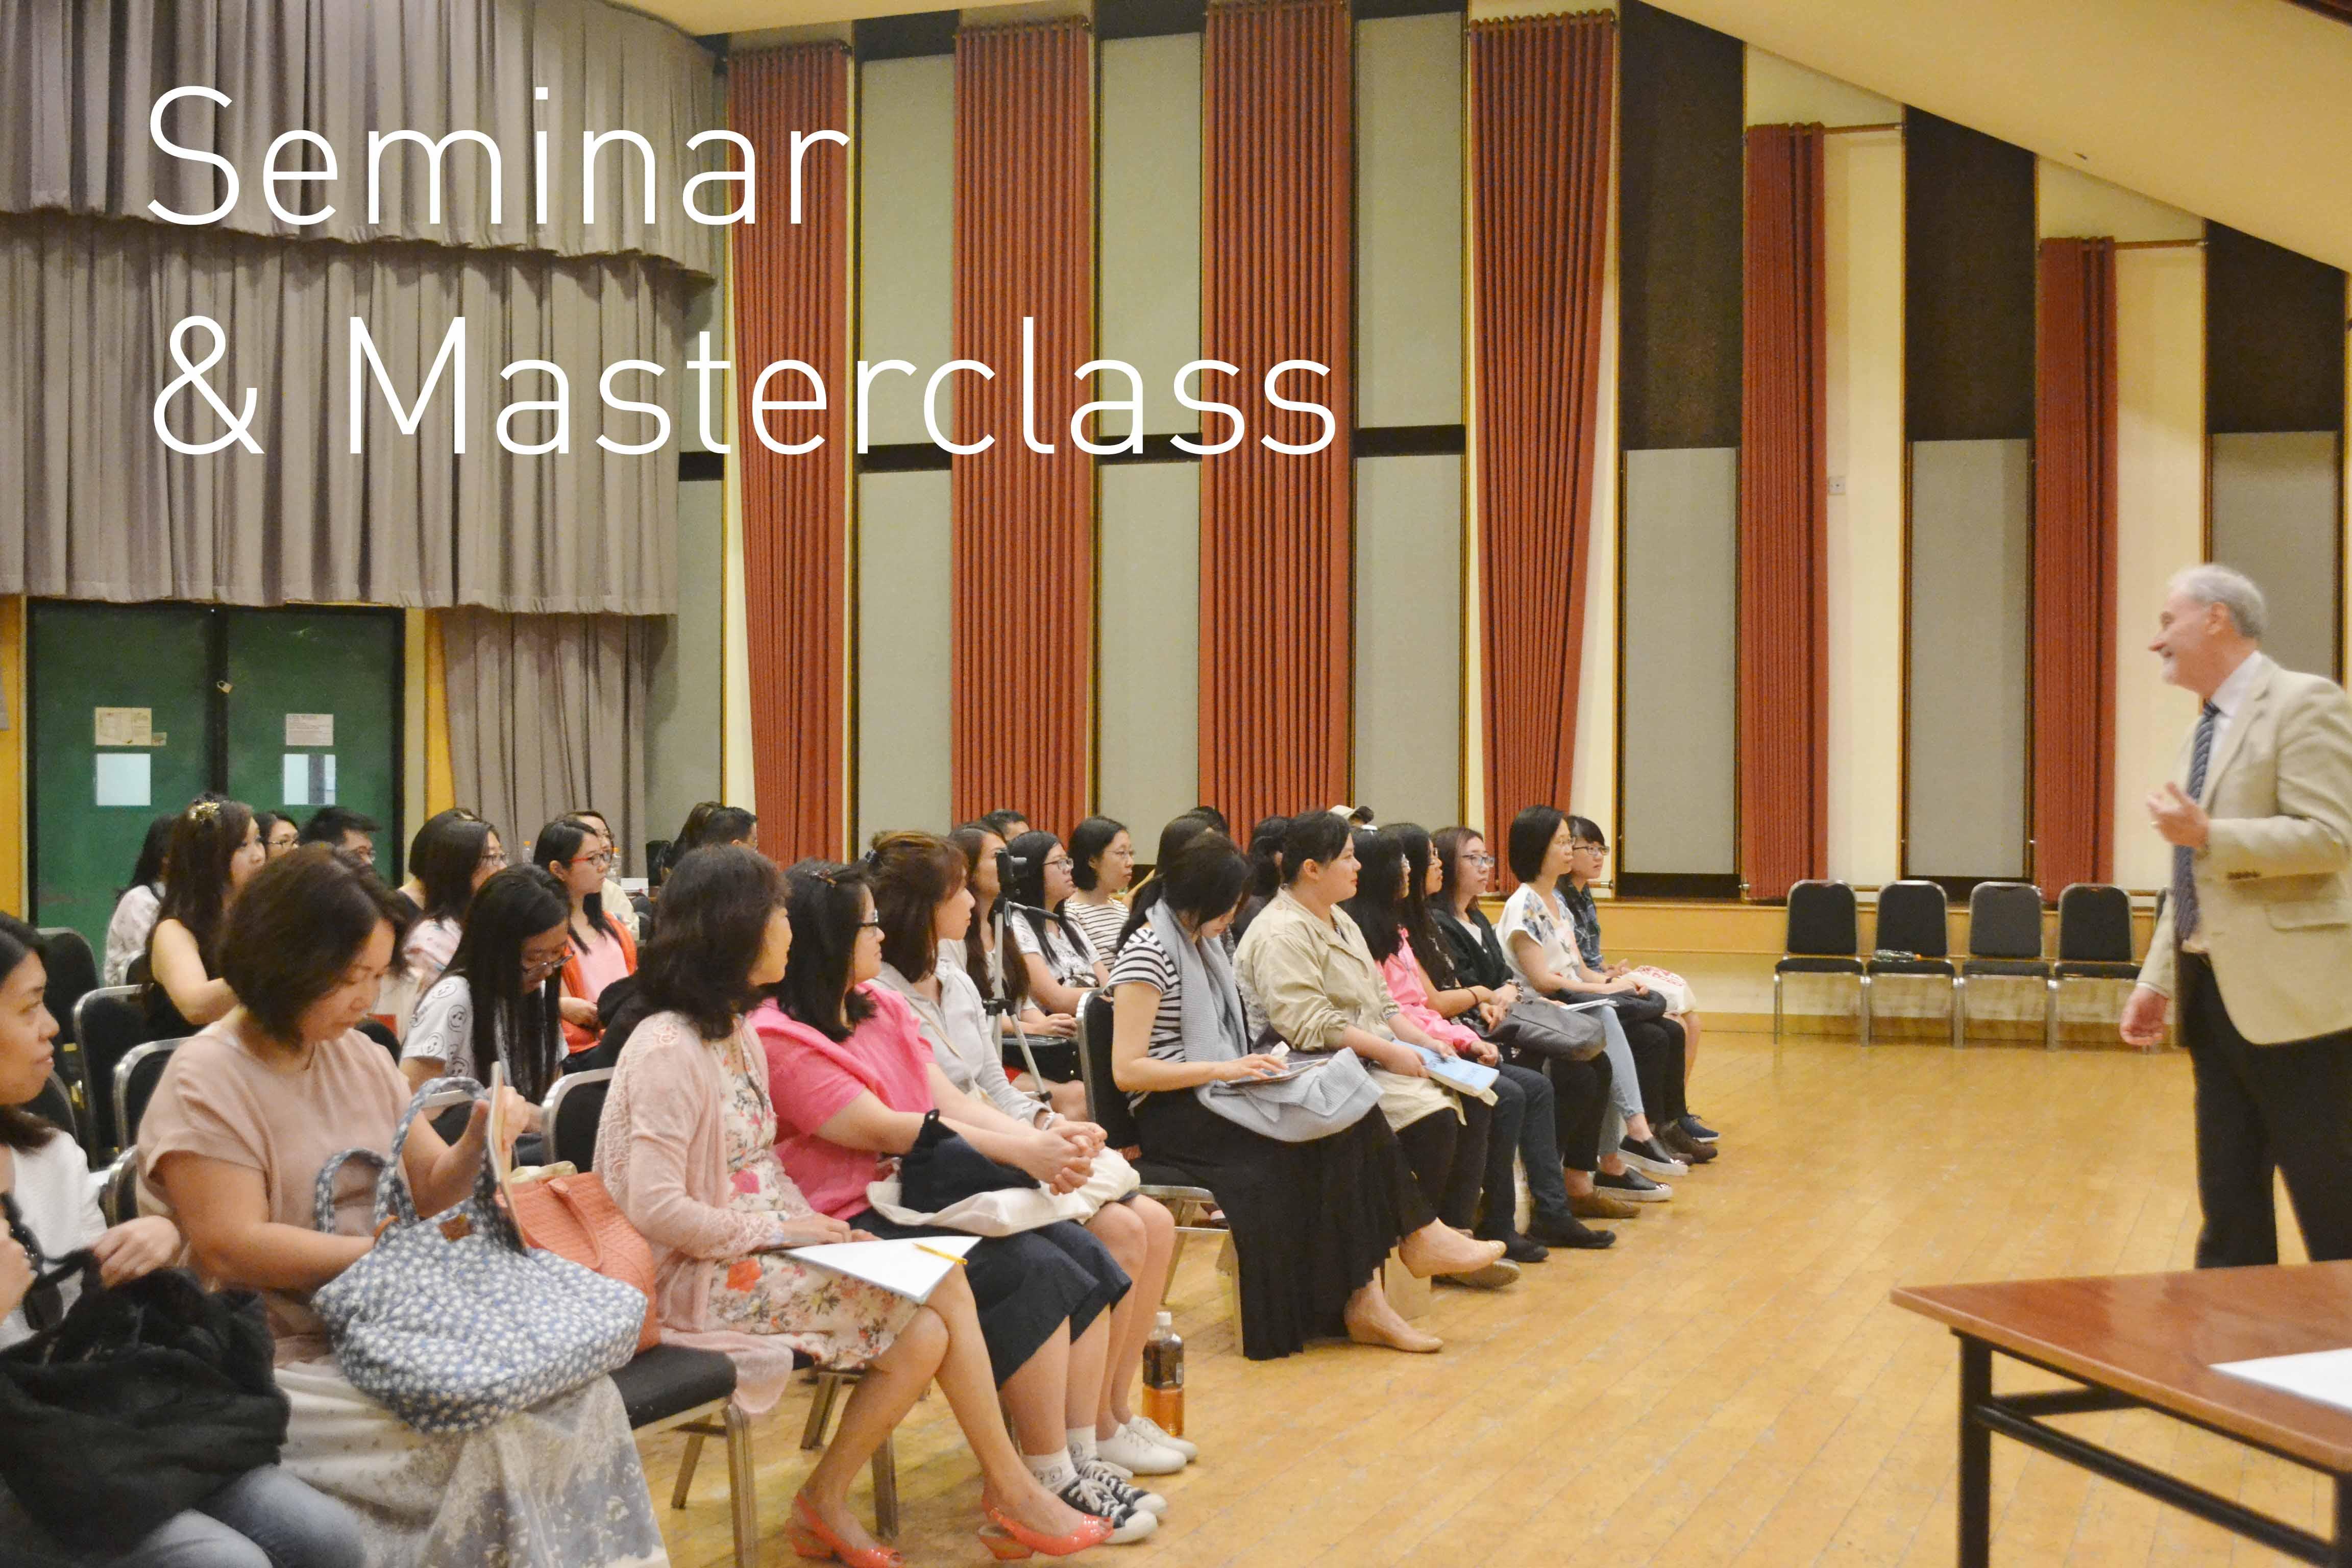 Seminar & Masterclass